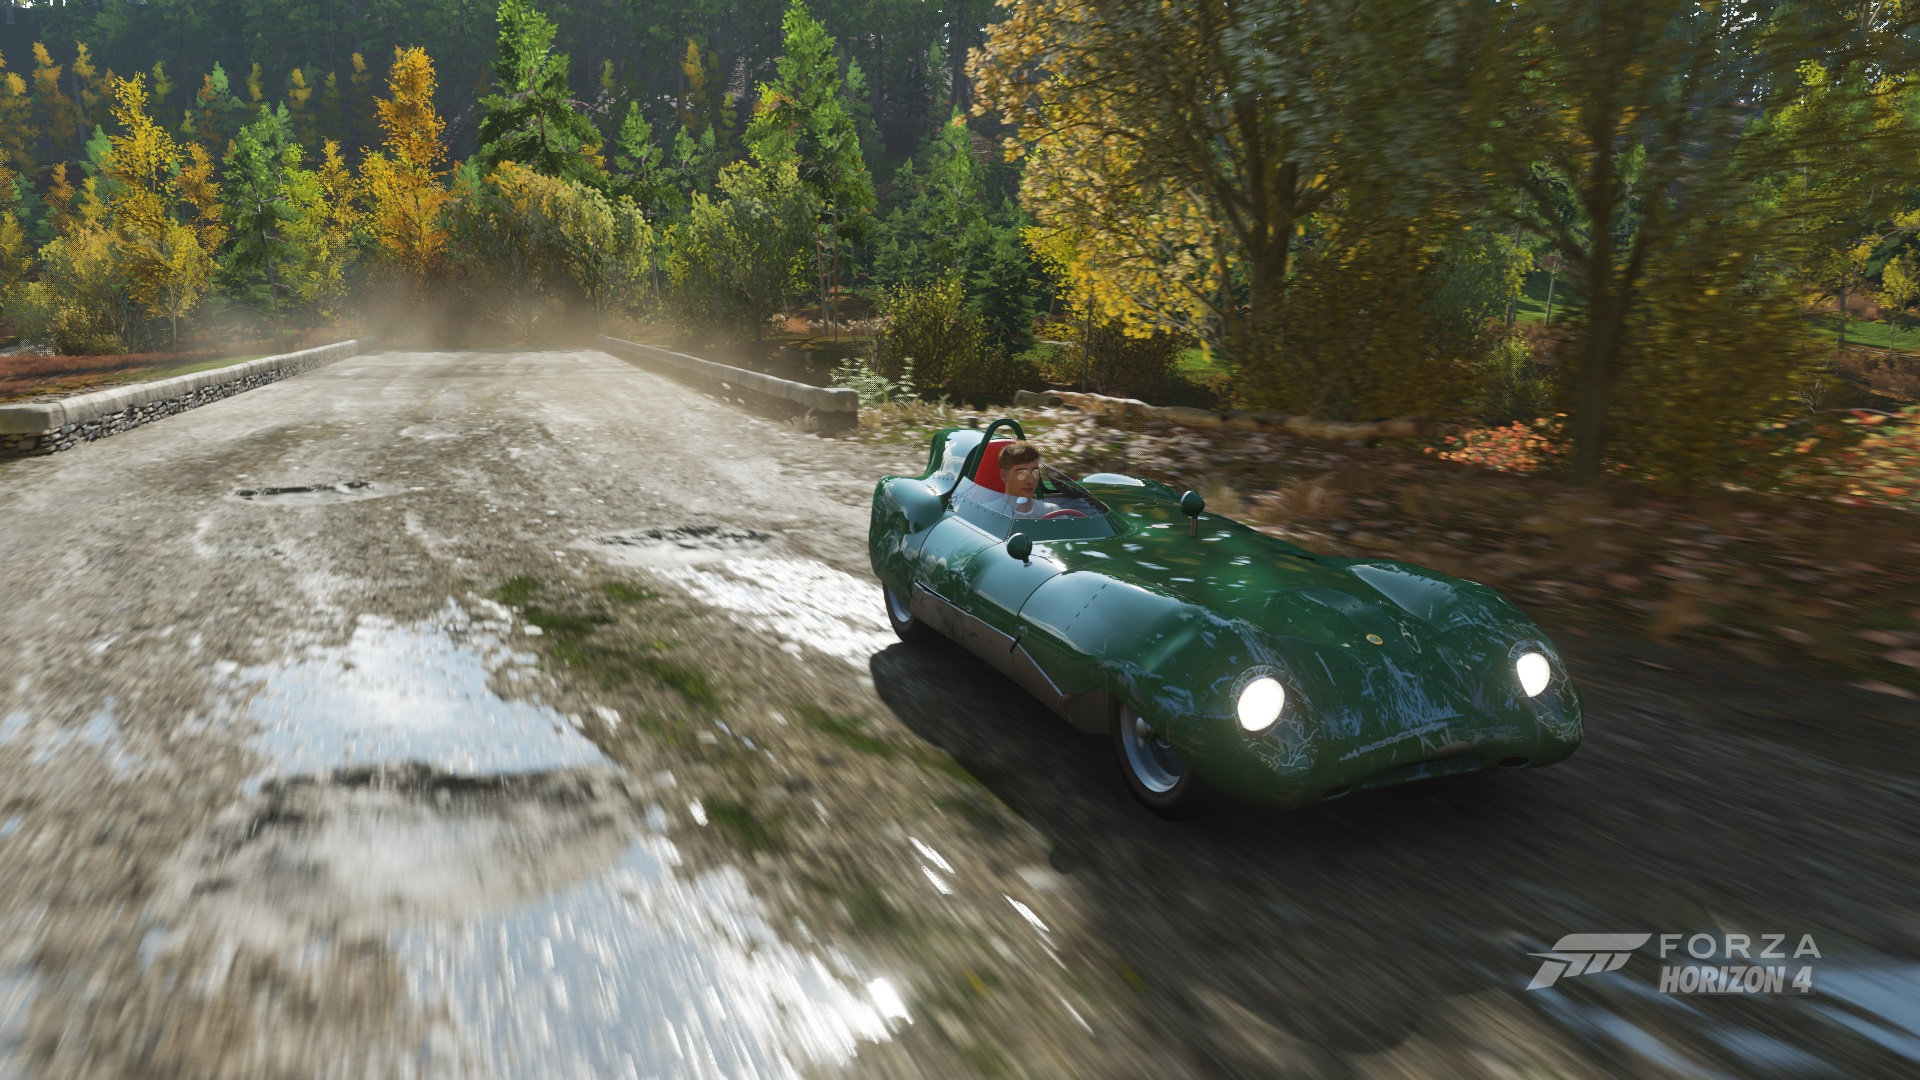 Forza Horizon 4 - CaRPG in the UK - Games - Quarter To Three